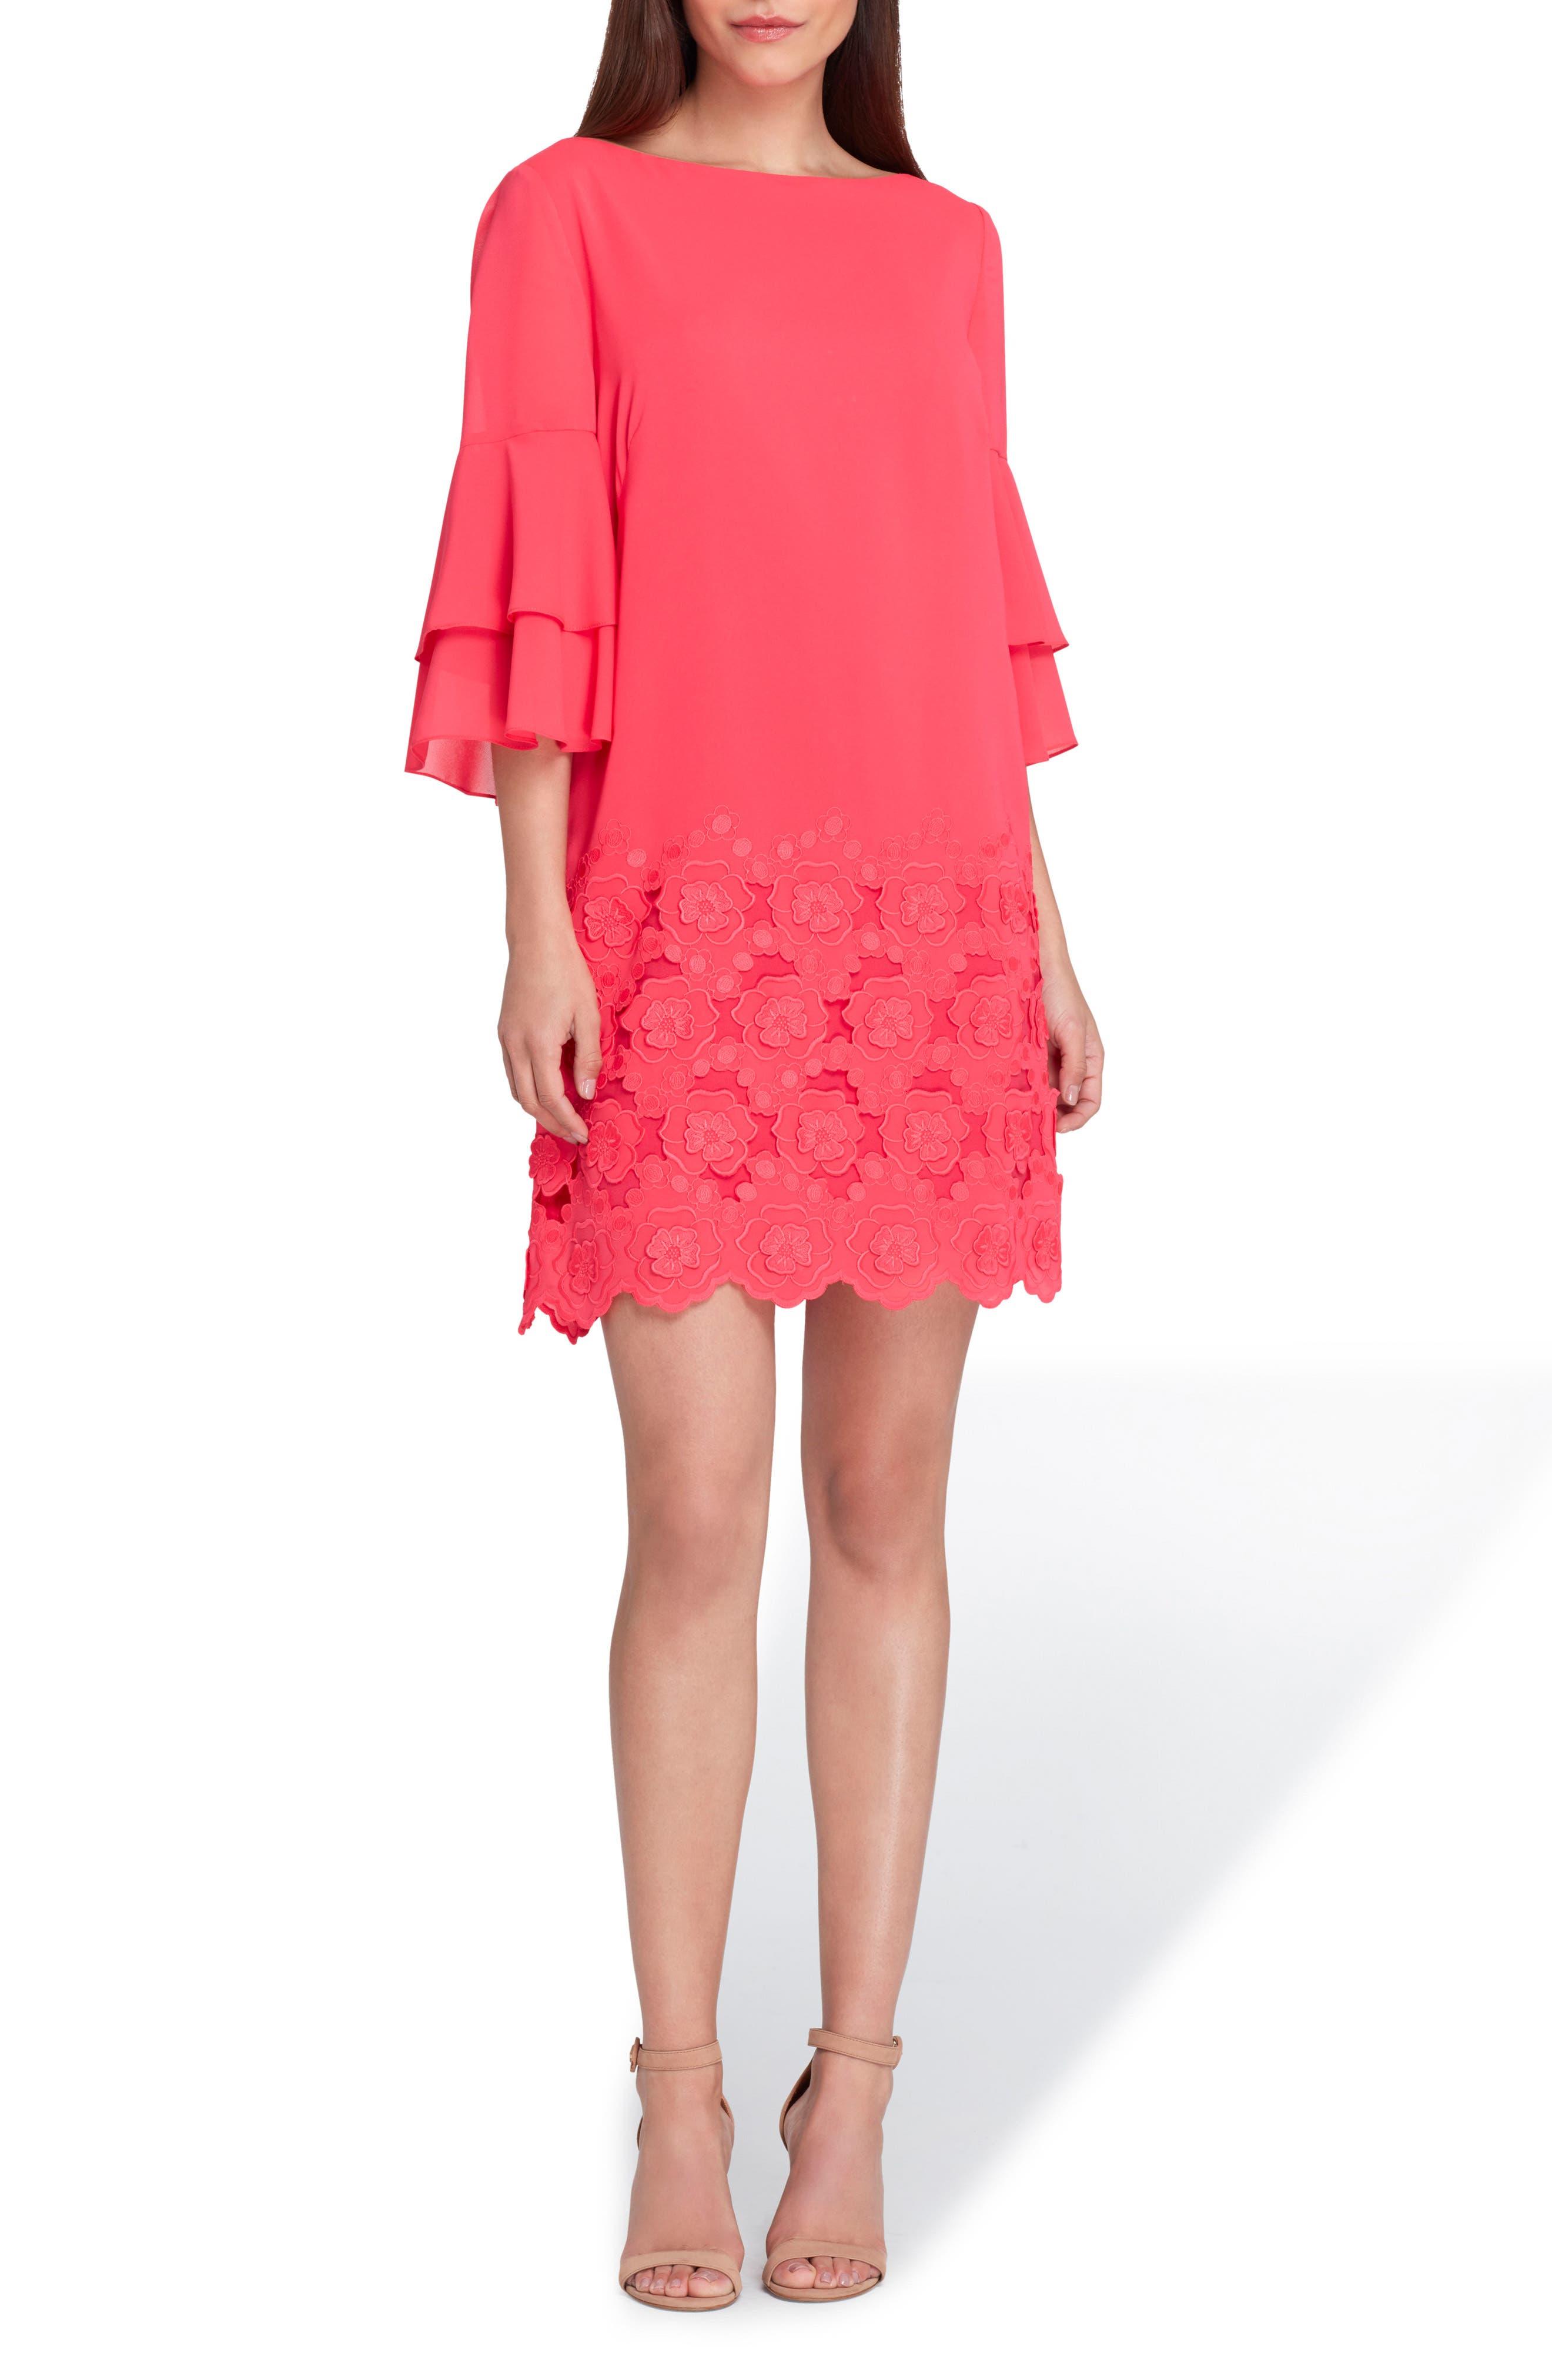 Tahari Embroidered Ruffle Sleeve Shift Dress